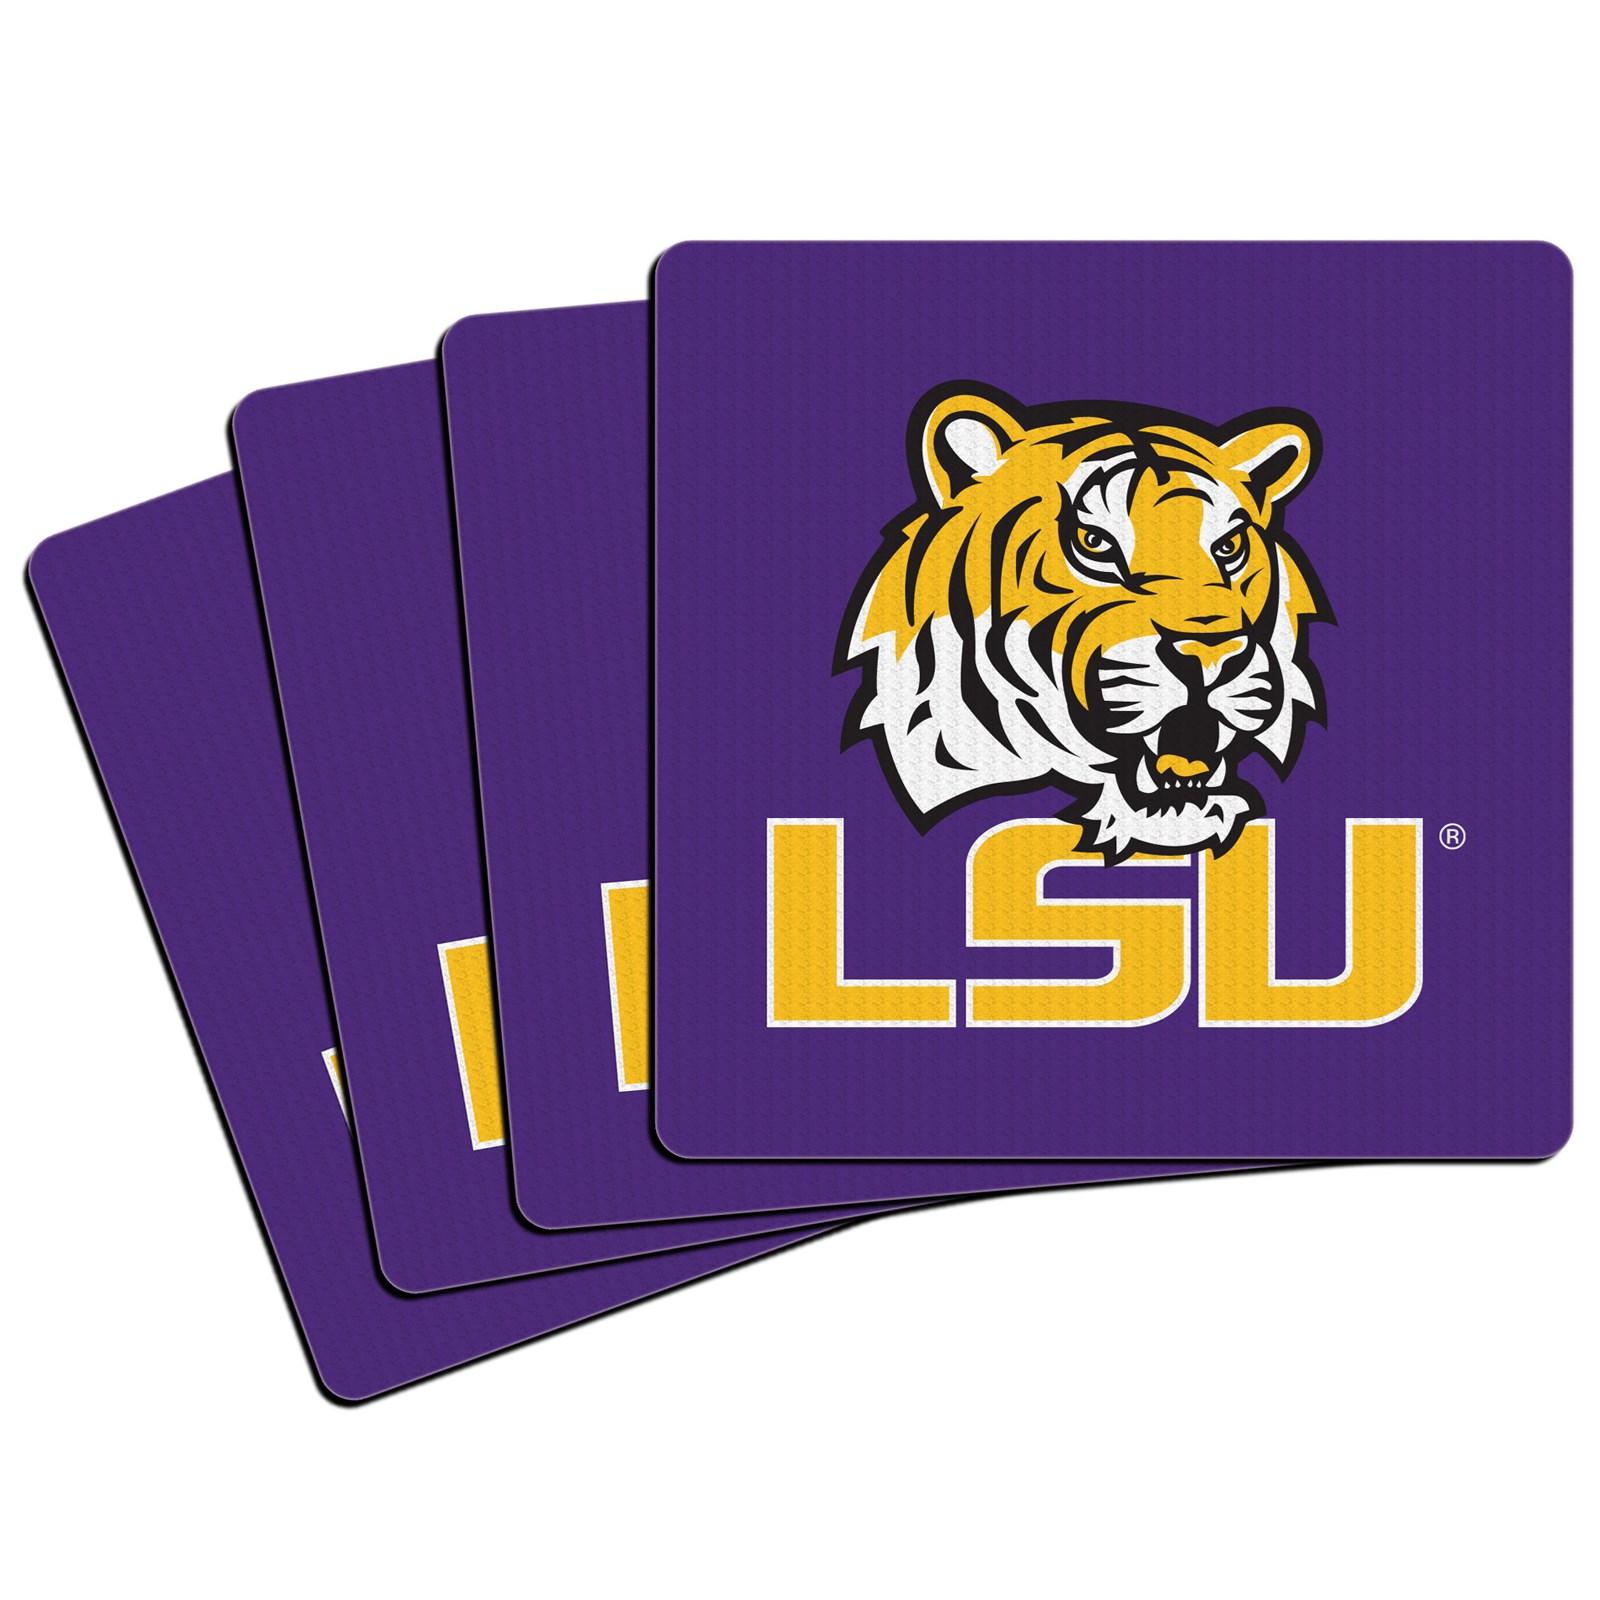 Image of Louisiana State Tigers (LSU) Neoprene Coasters